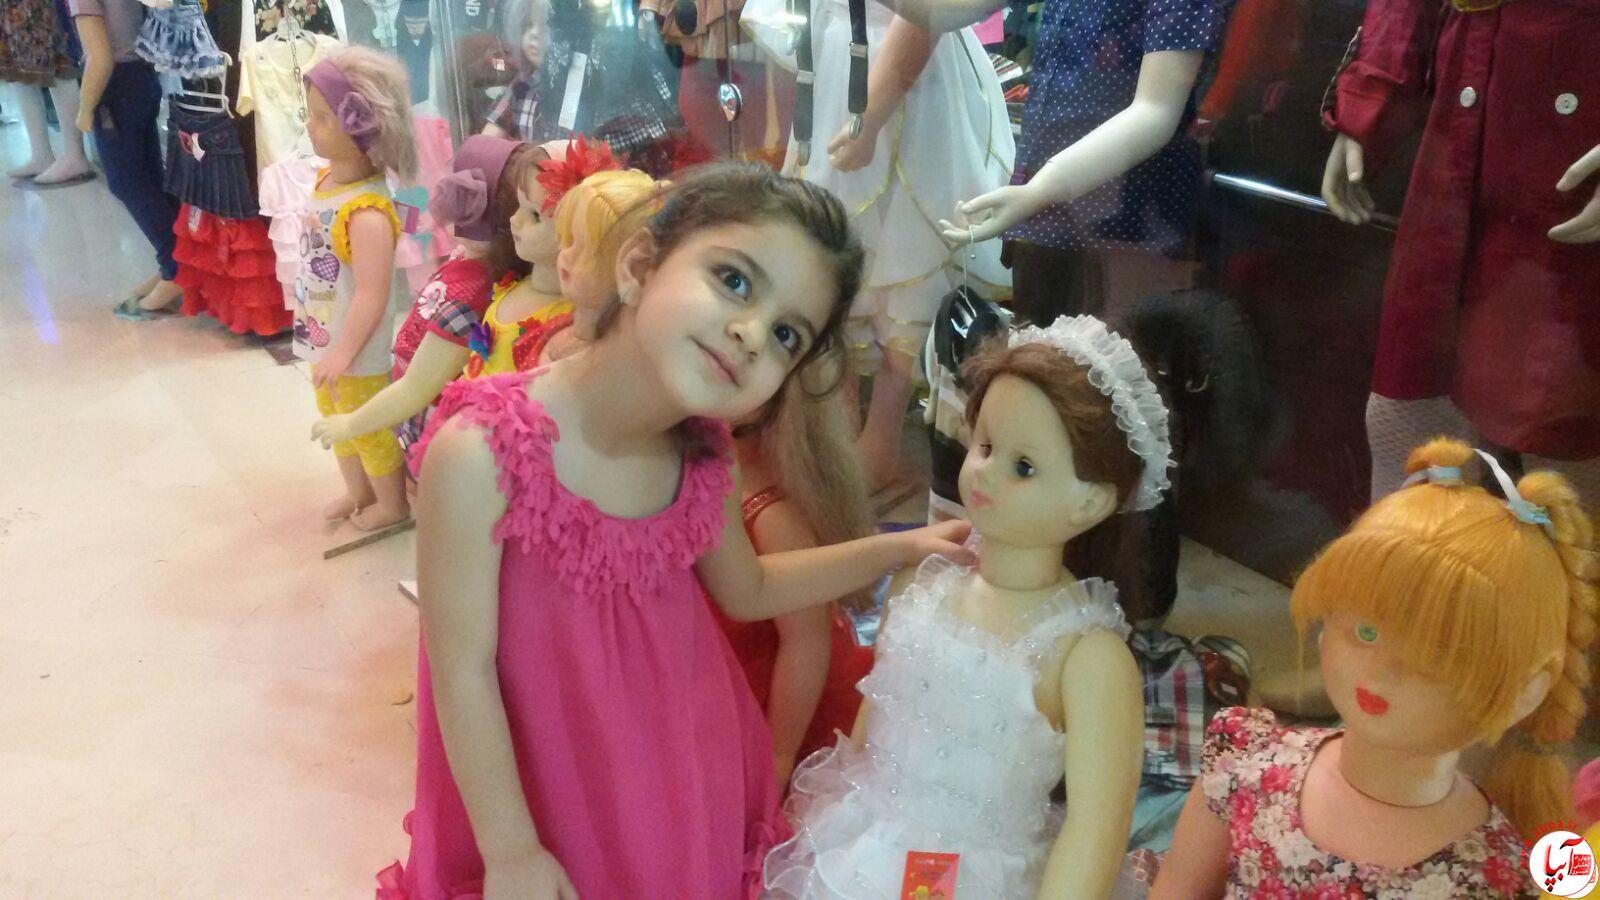 IMG-20150814-WA0003 گالری عکس گلها : این فرشته ها ...